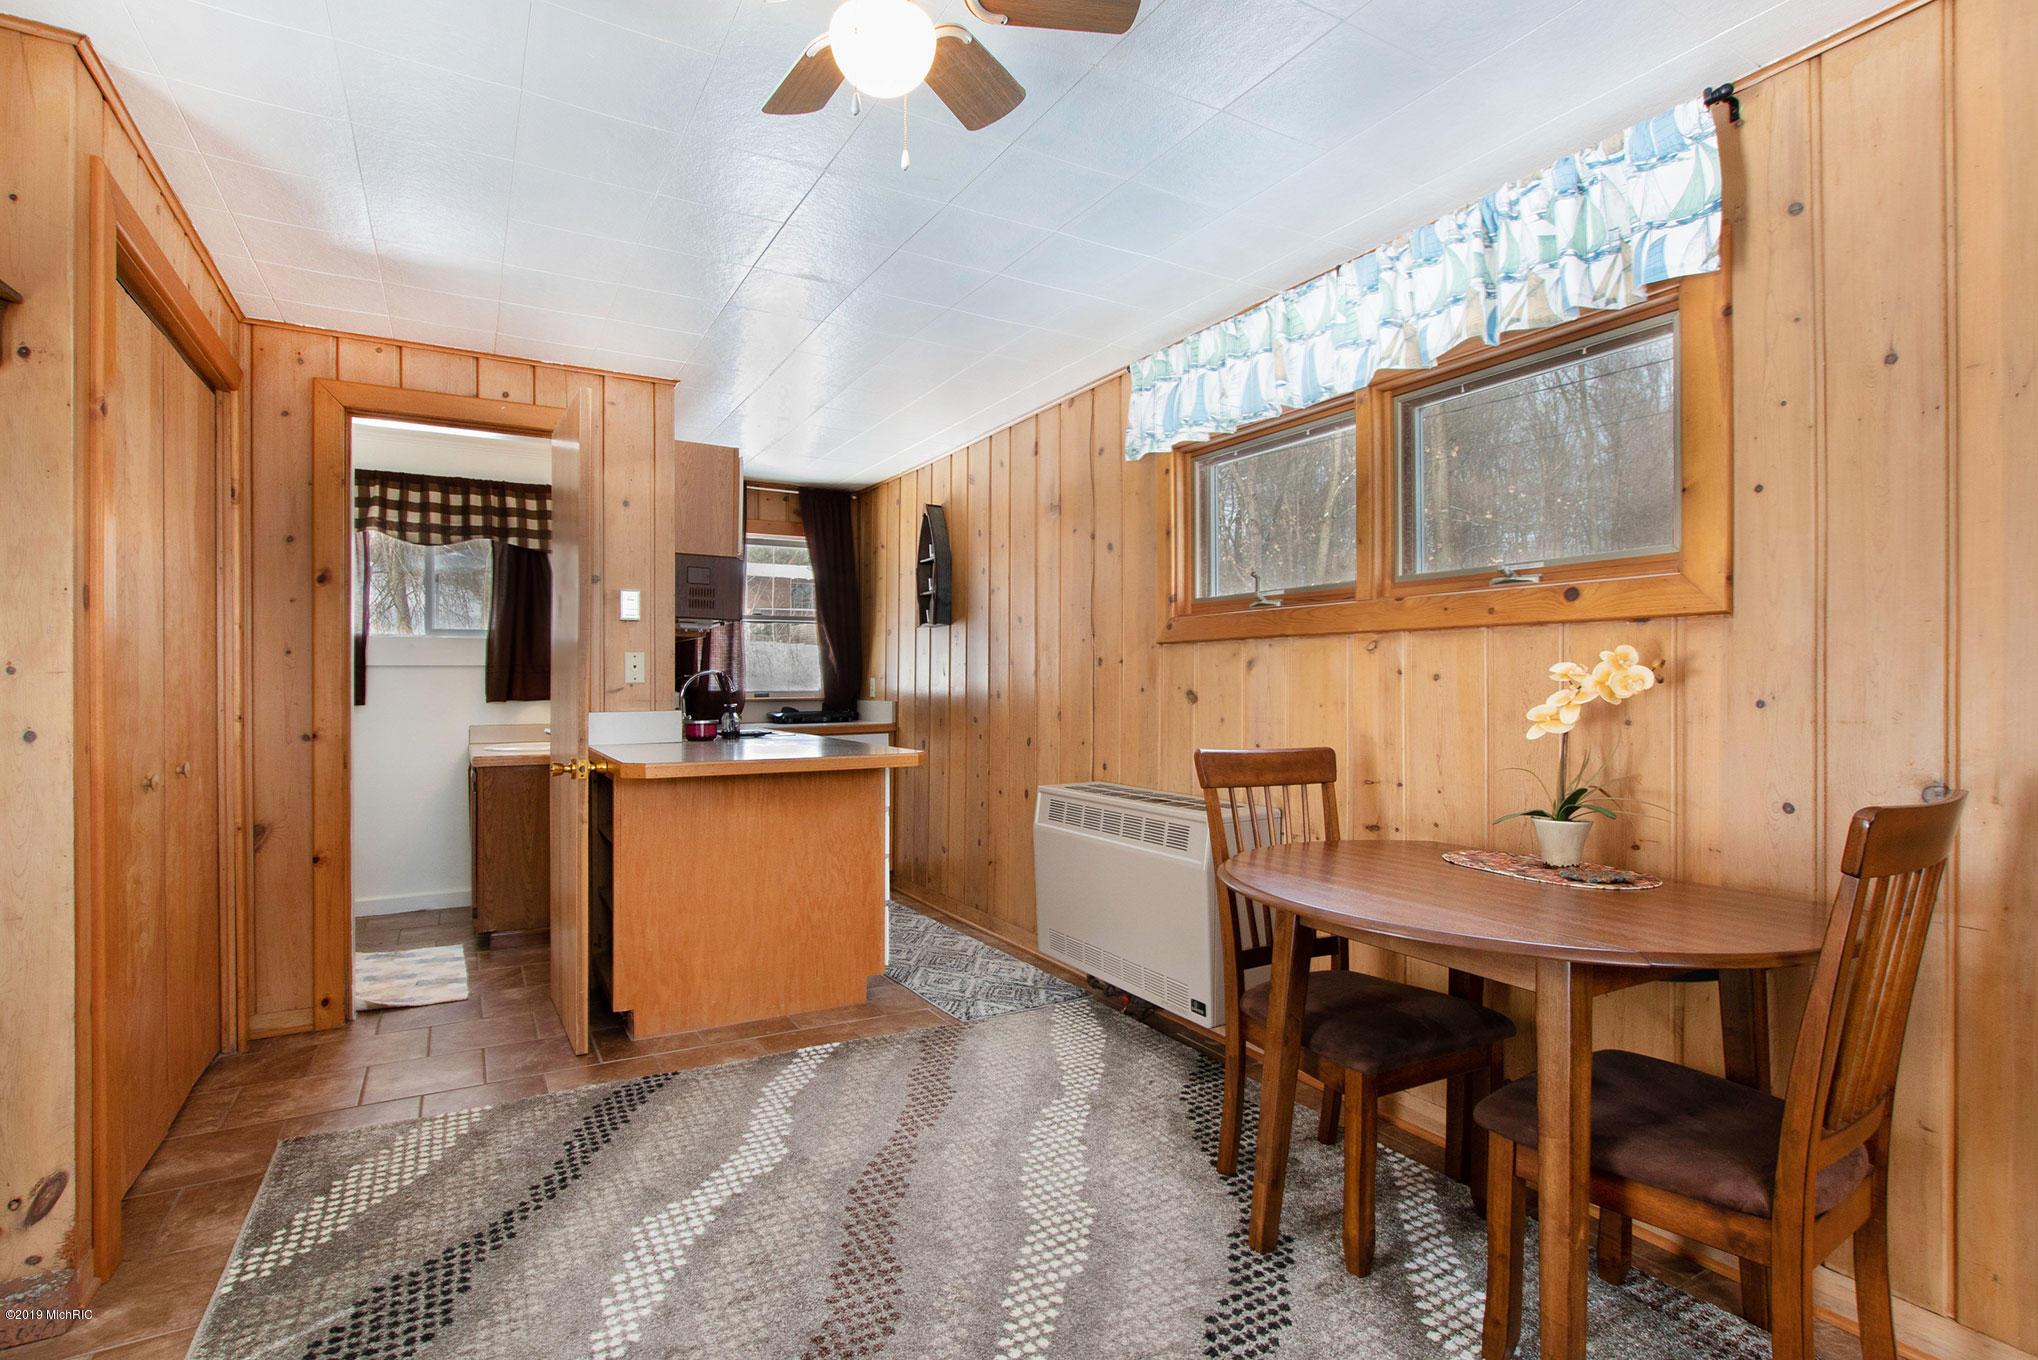 10537 Wildwood Drive, Richland, Michigan 49083, 2 Bedrooms Bedrooms, ,2 BathroomsBathrooms,Residential,For Sale,Wildwood,19008228